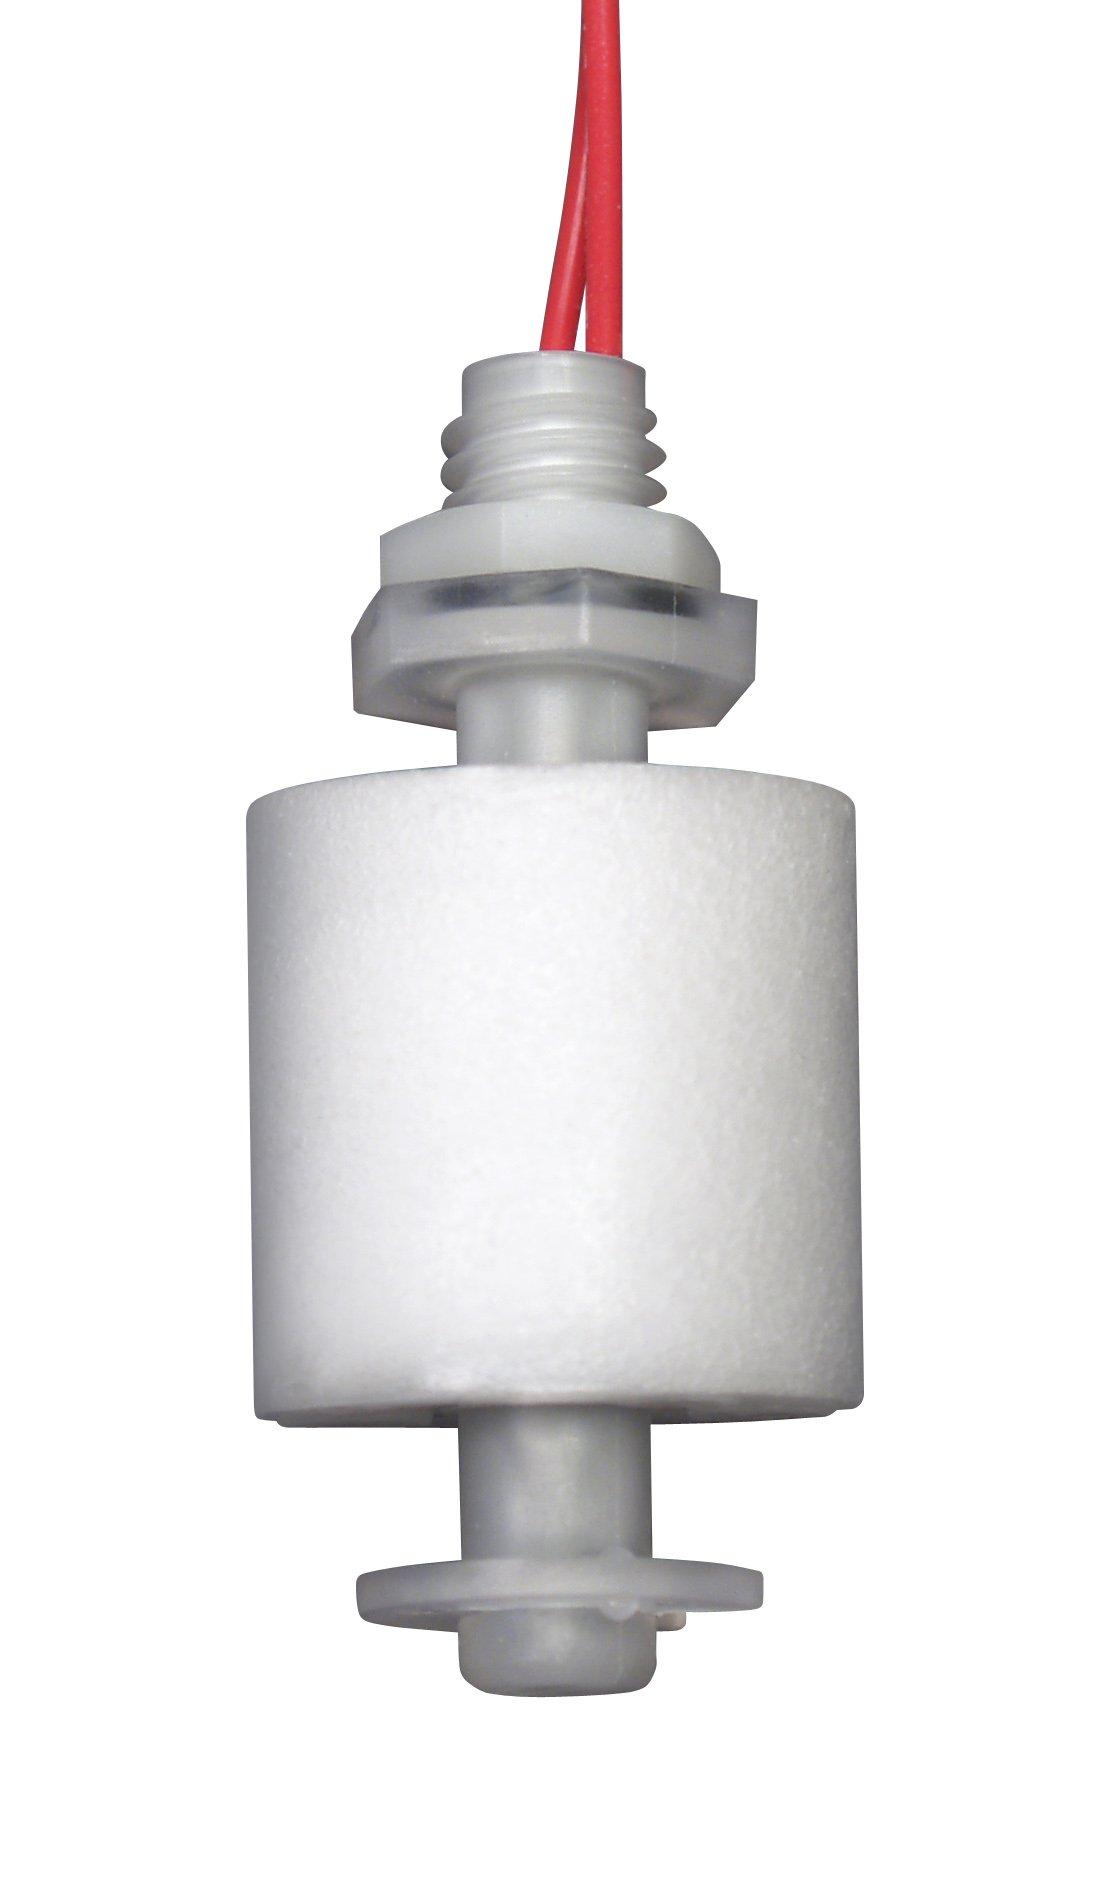 Madison M8000B Plastic Full Size Metric Miniature Liquid Level Float Switch with Polypropylene Stem, 30 VA SPST, Bulkhead, 6 Bar Pressure